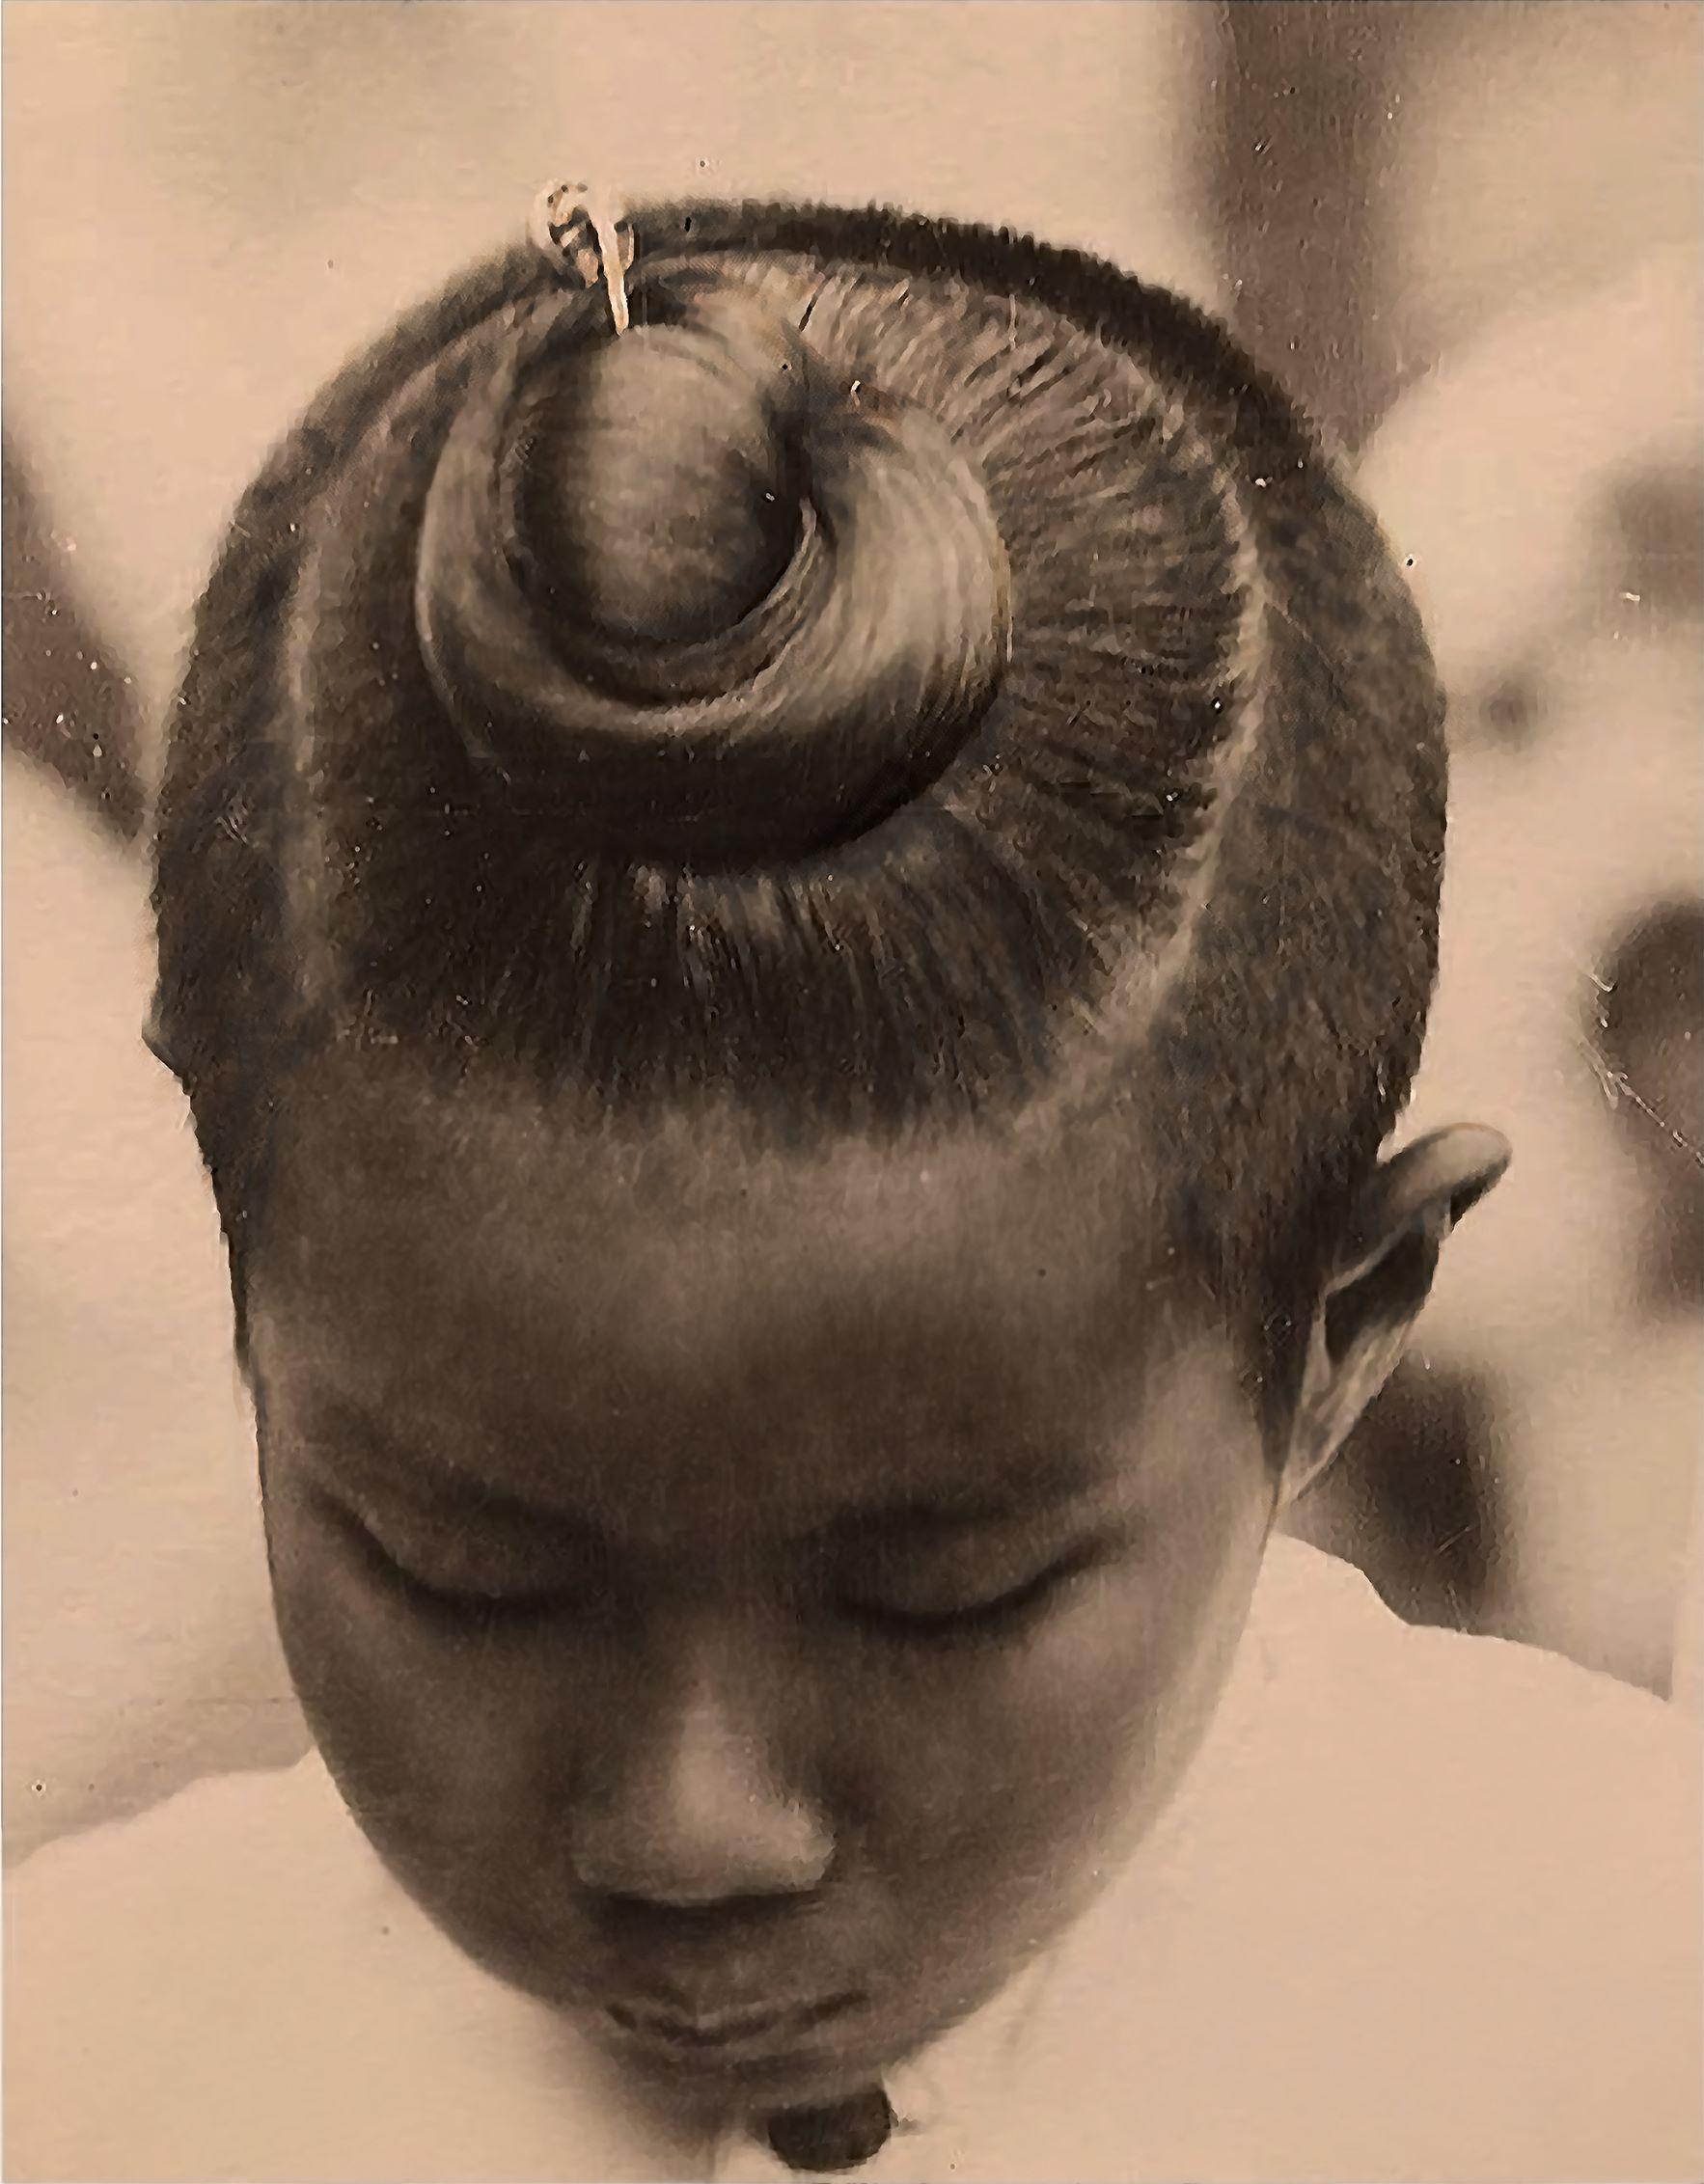 Thai Style Studio 1984 ทรงผมเด็กไทยในสมัยโบราณ / ความเชื่อกับทรงผม 9